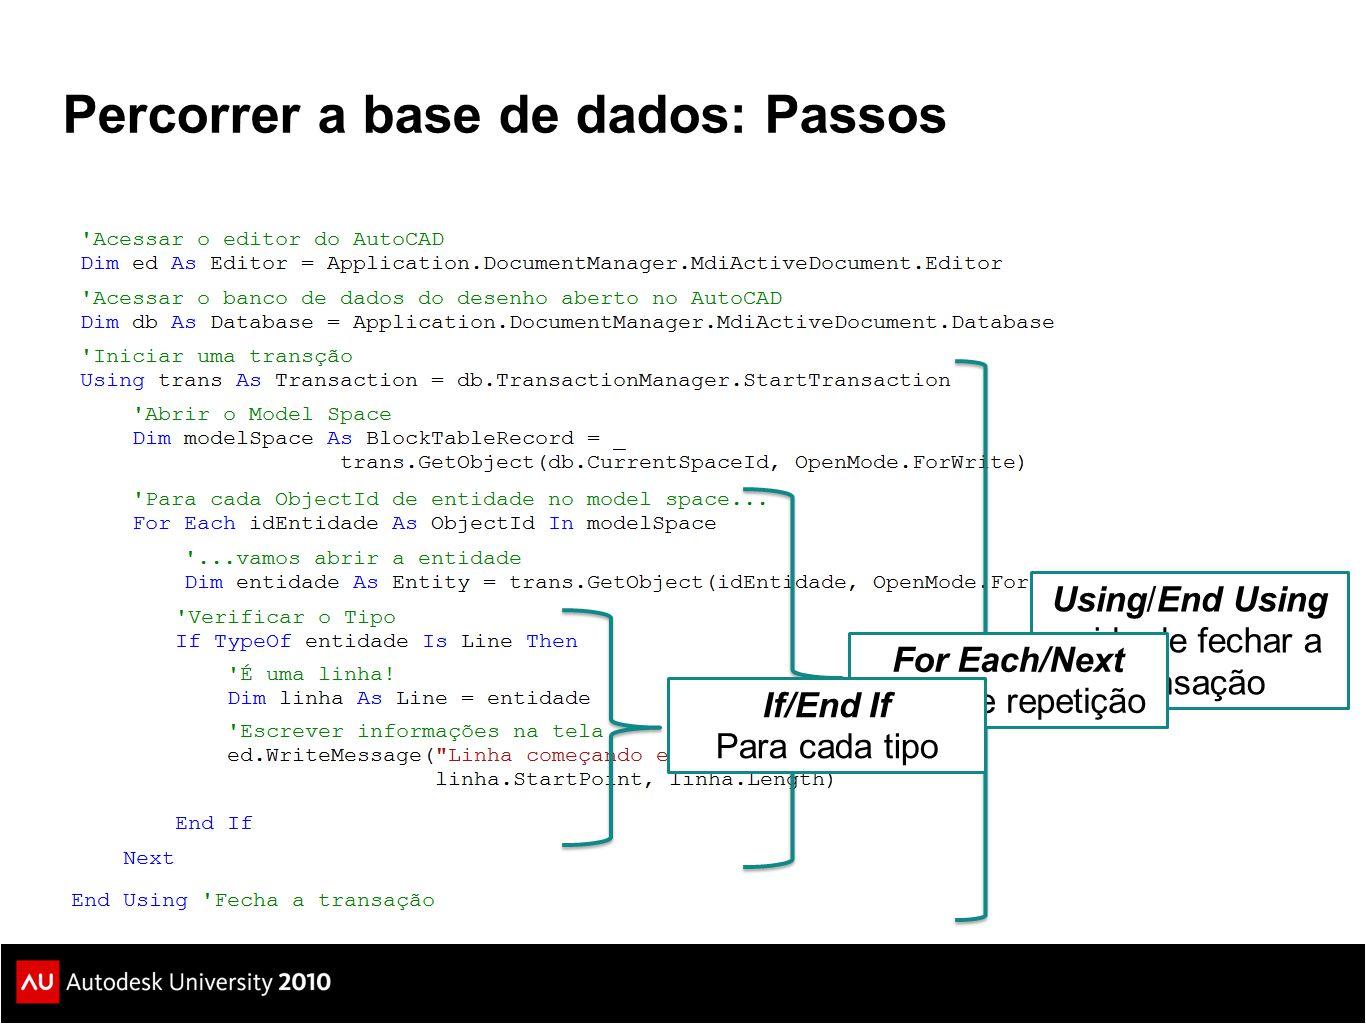 Percorrer a base de dados: Passos